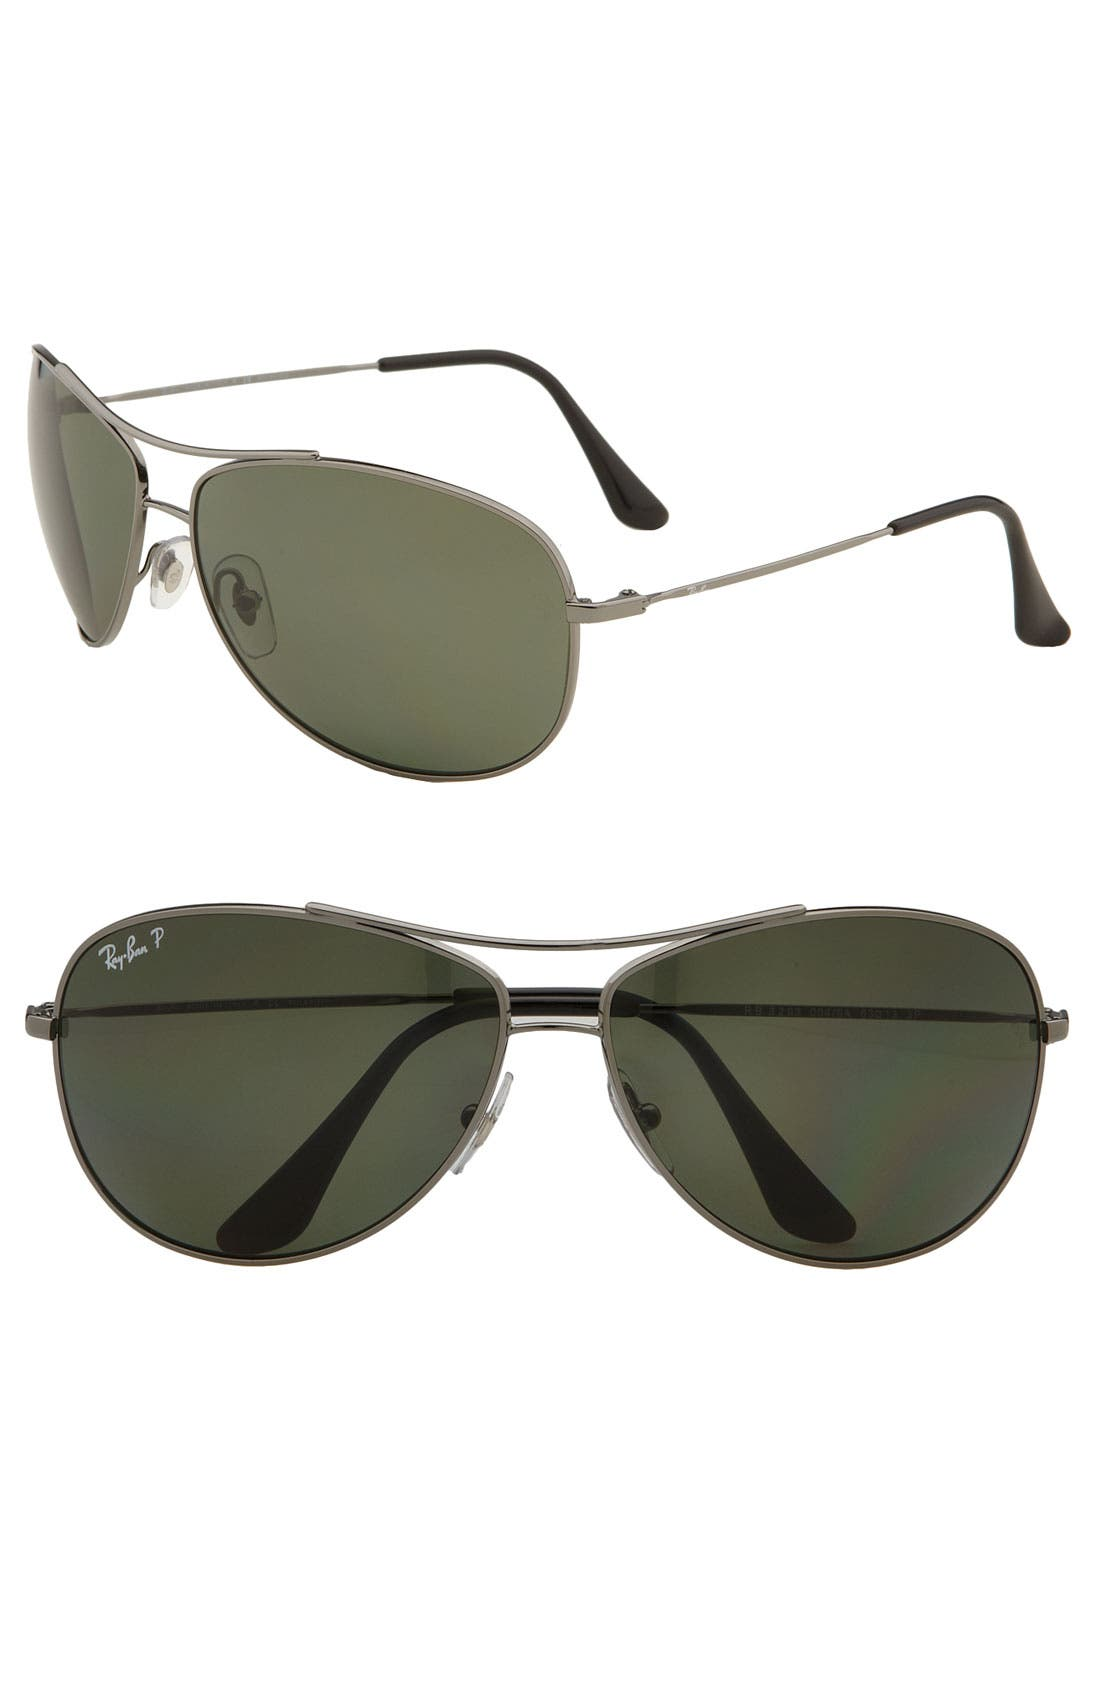 Main Image - Ray-Ban 'Bubble Wrap Aviator' Polarized 63mm Sunglasses